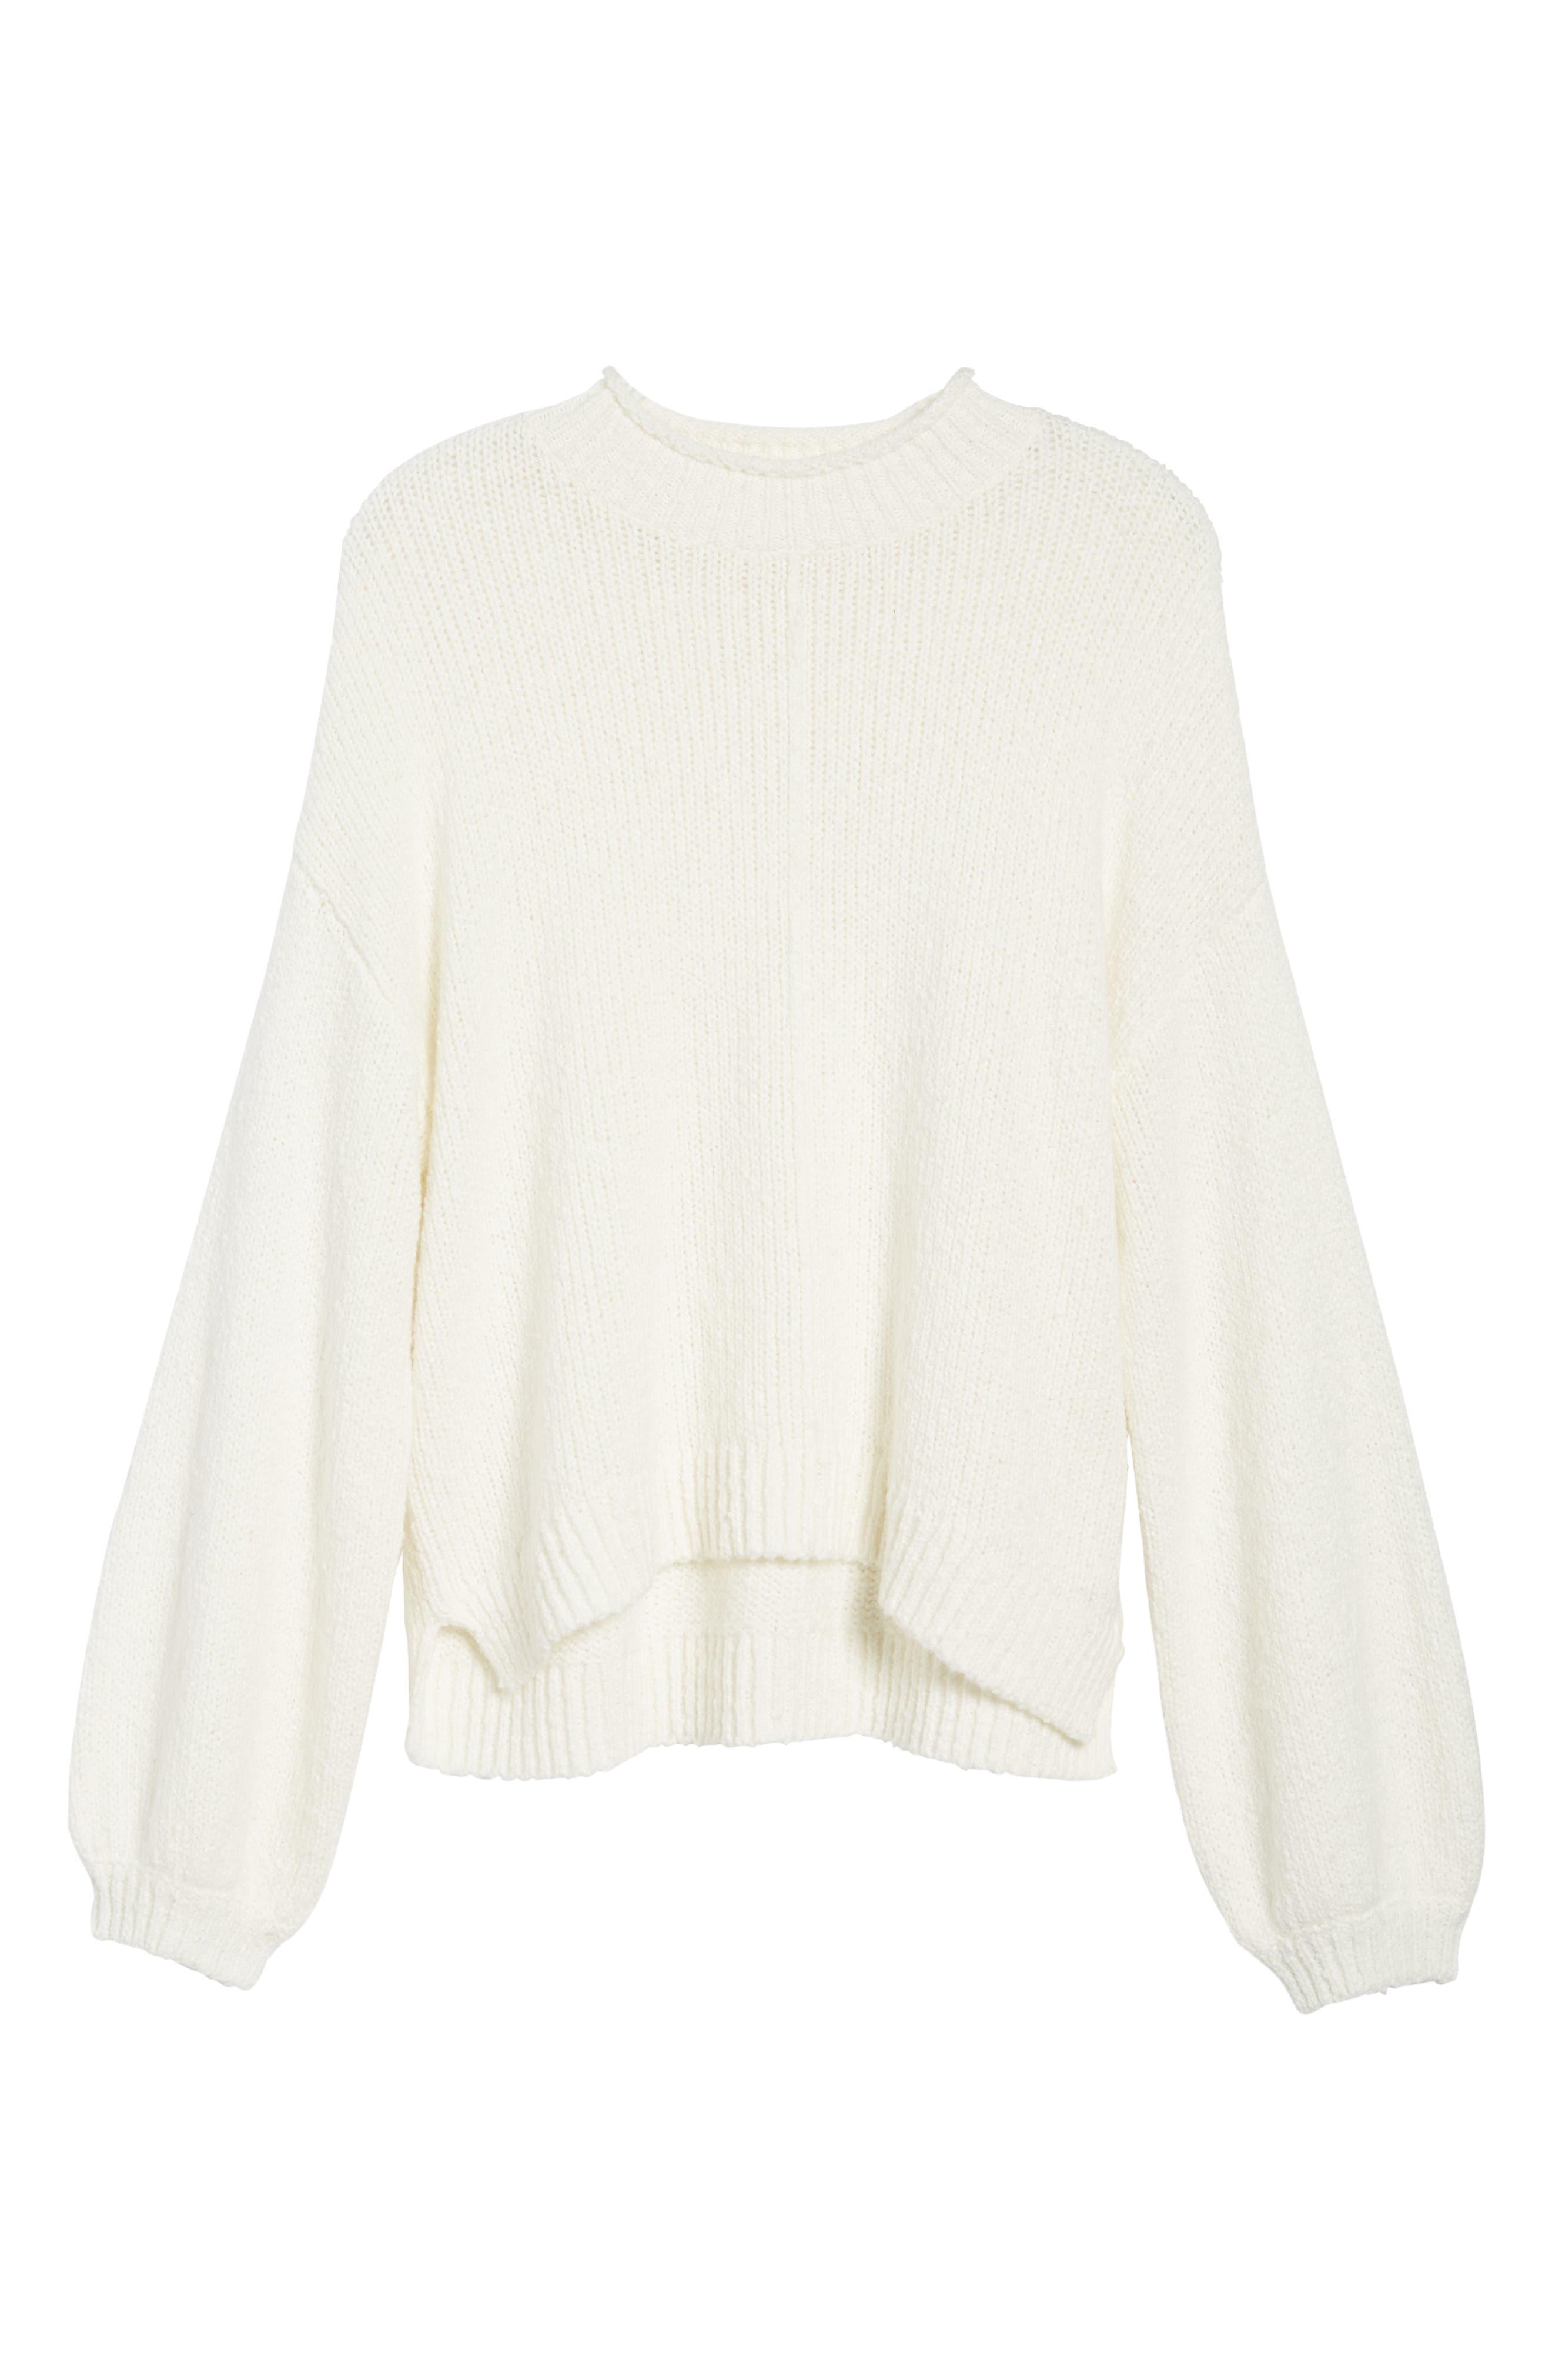 Balloon Sleeve Sweater,                             Alternate thumbnail 7, color,                             Ivory